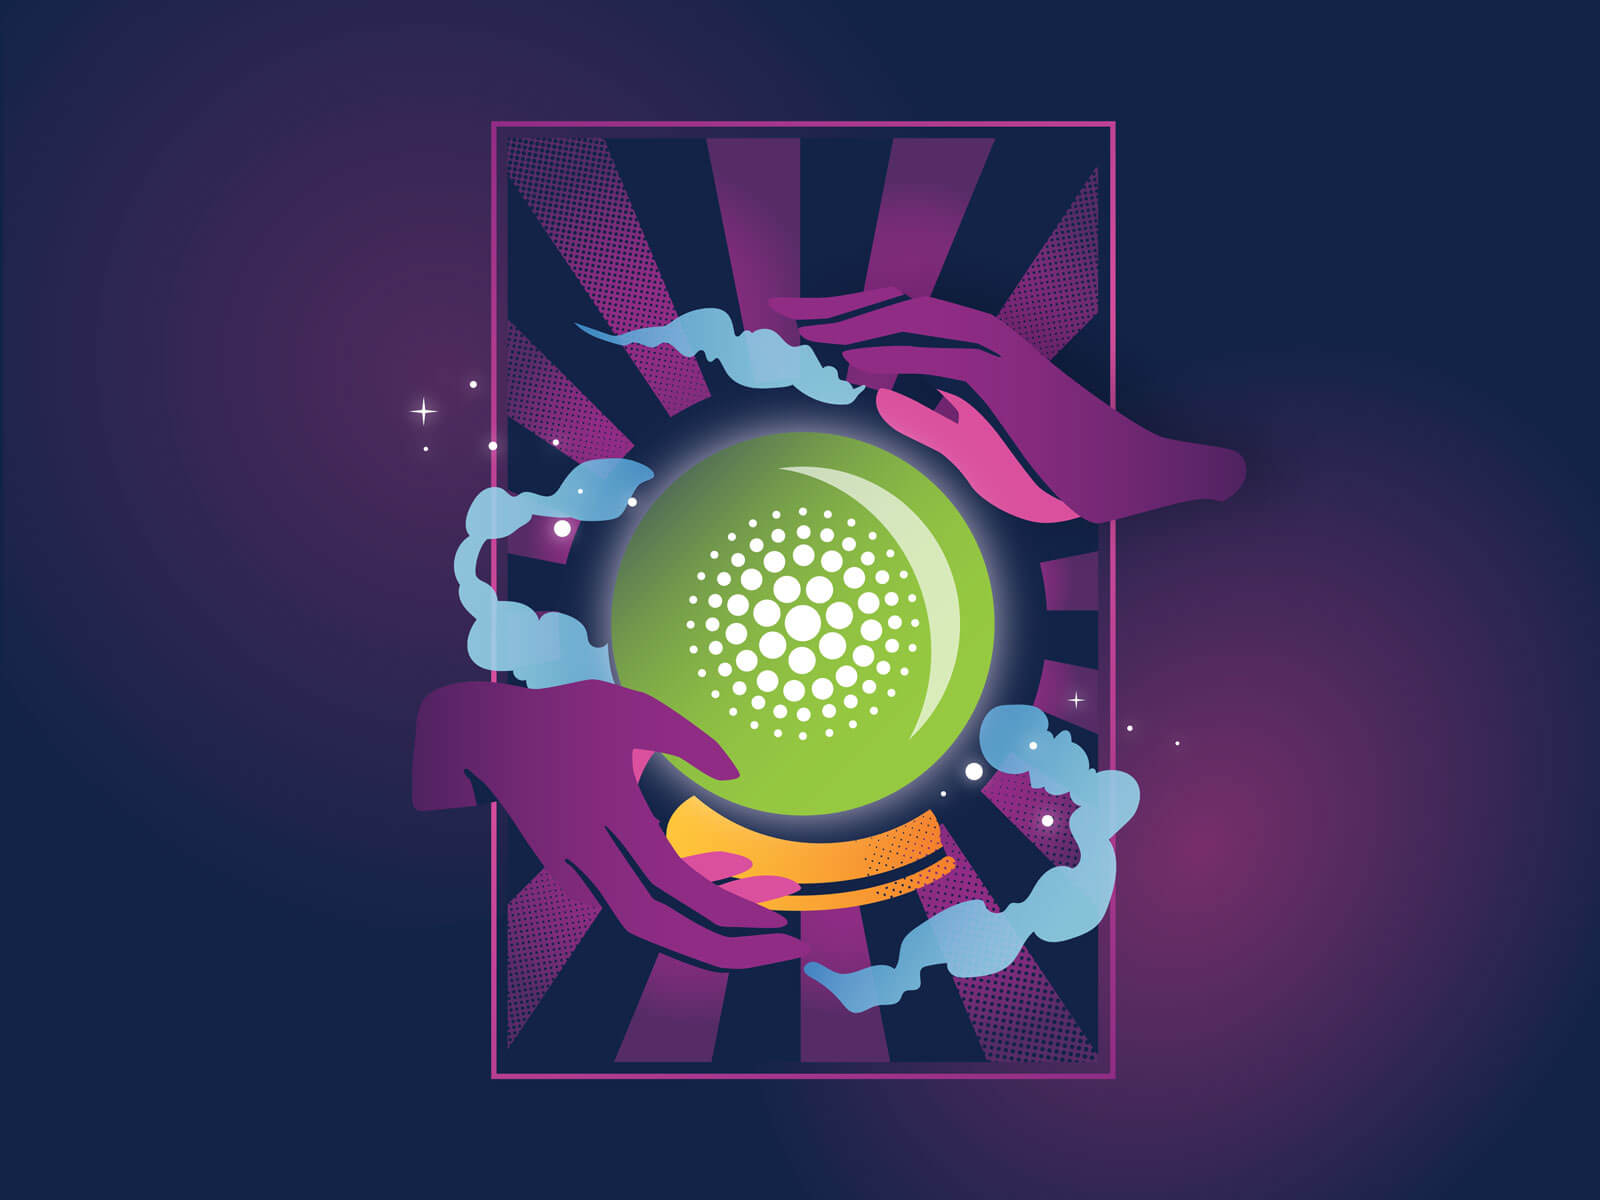 Hands around a magic crystal ball revealing the CircleCI orbs logo.